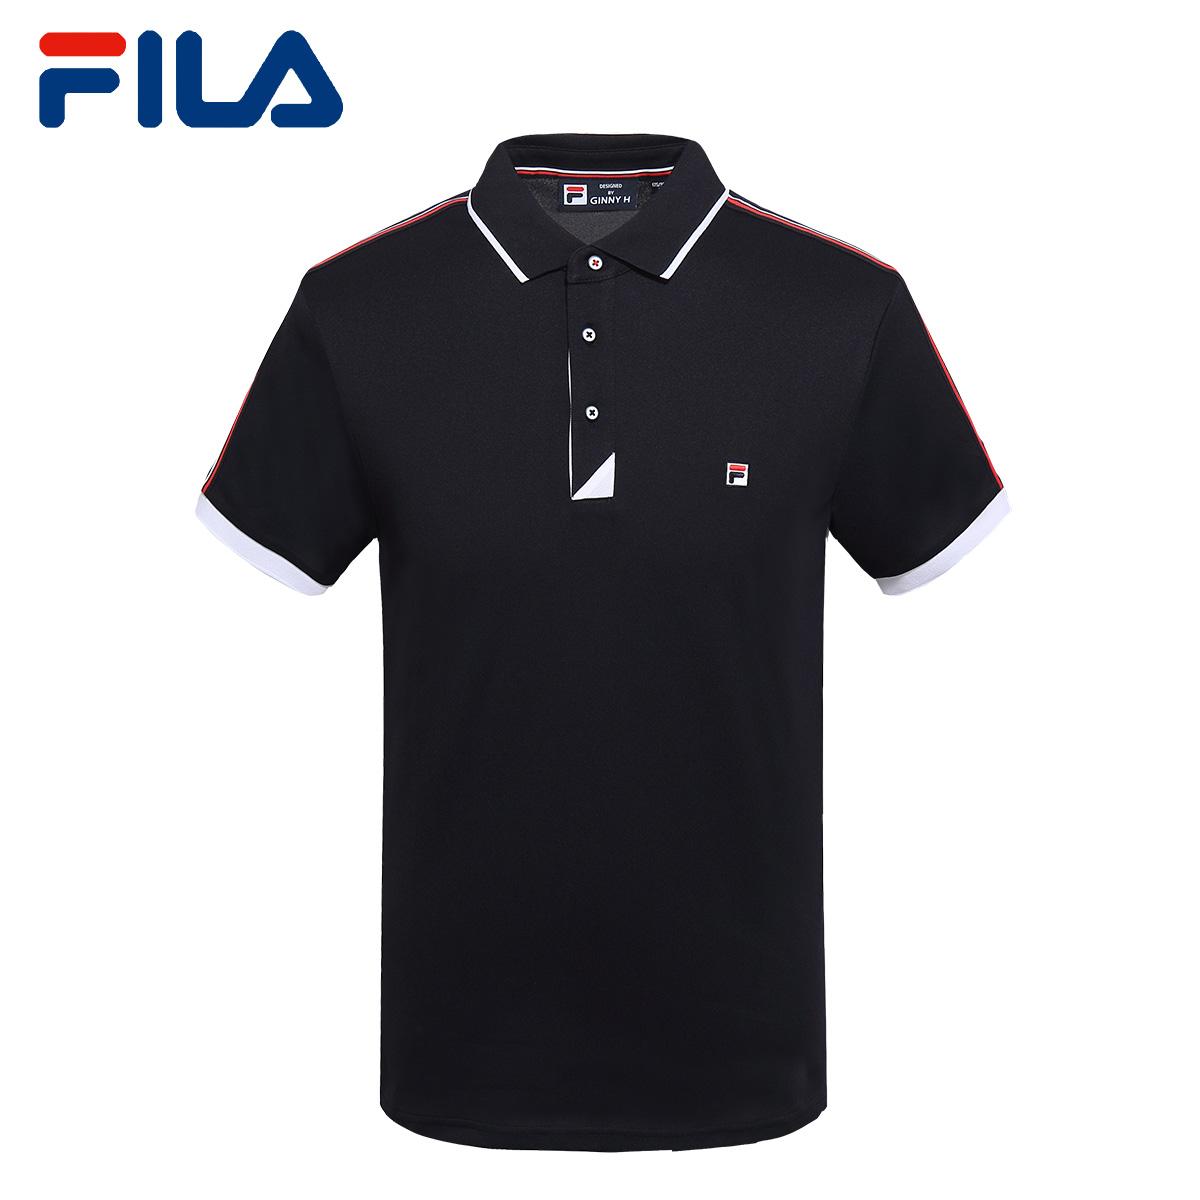 FILA斐乐男T恤2018夏季新款短袖POLO衫休闲时尚运动T恤男